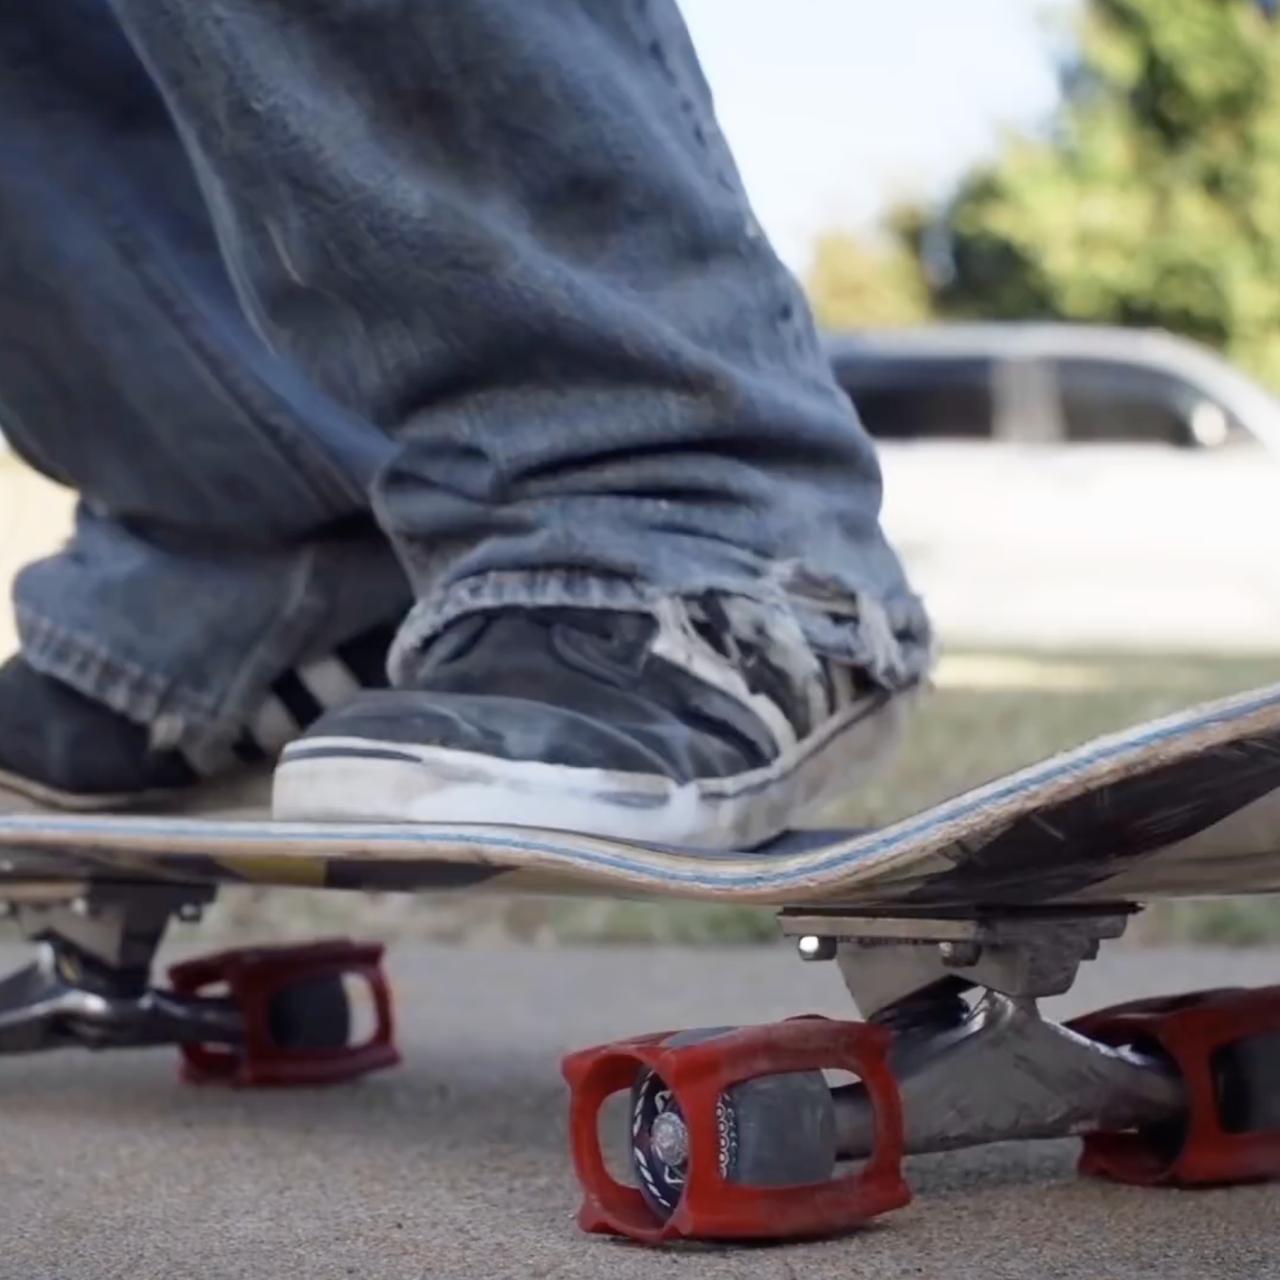 SkaterTrainer Trick Learning Tool